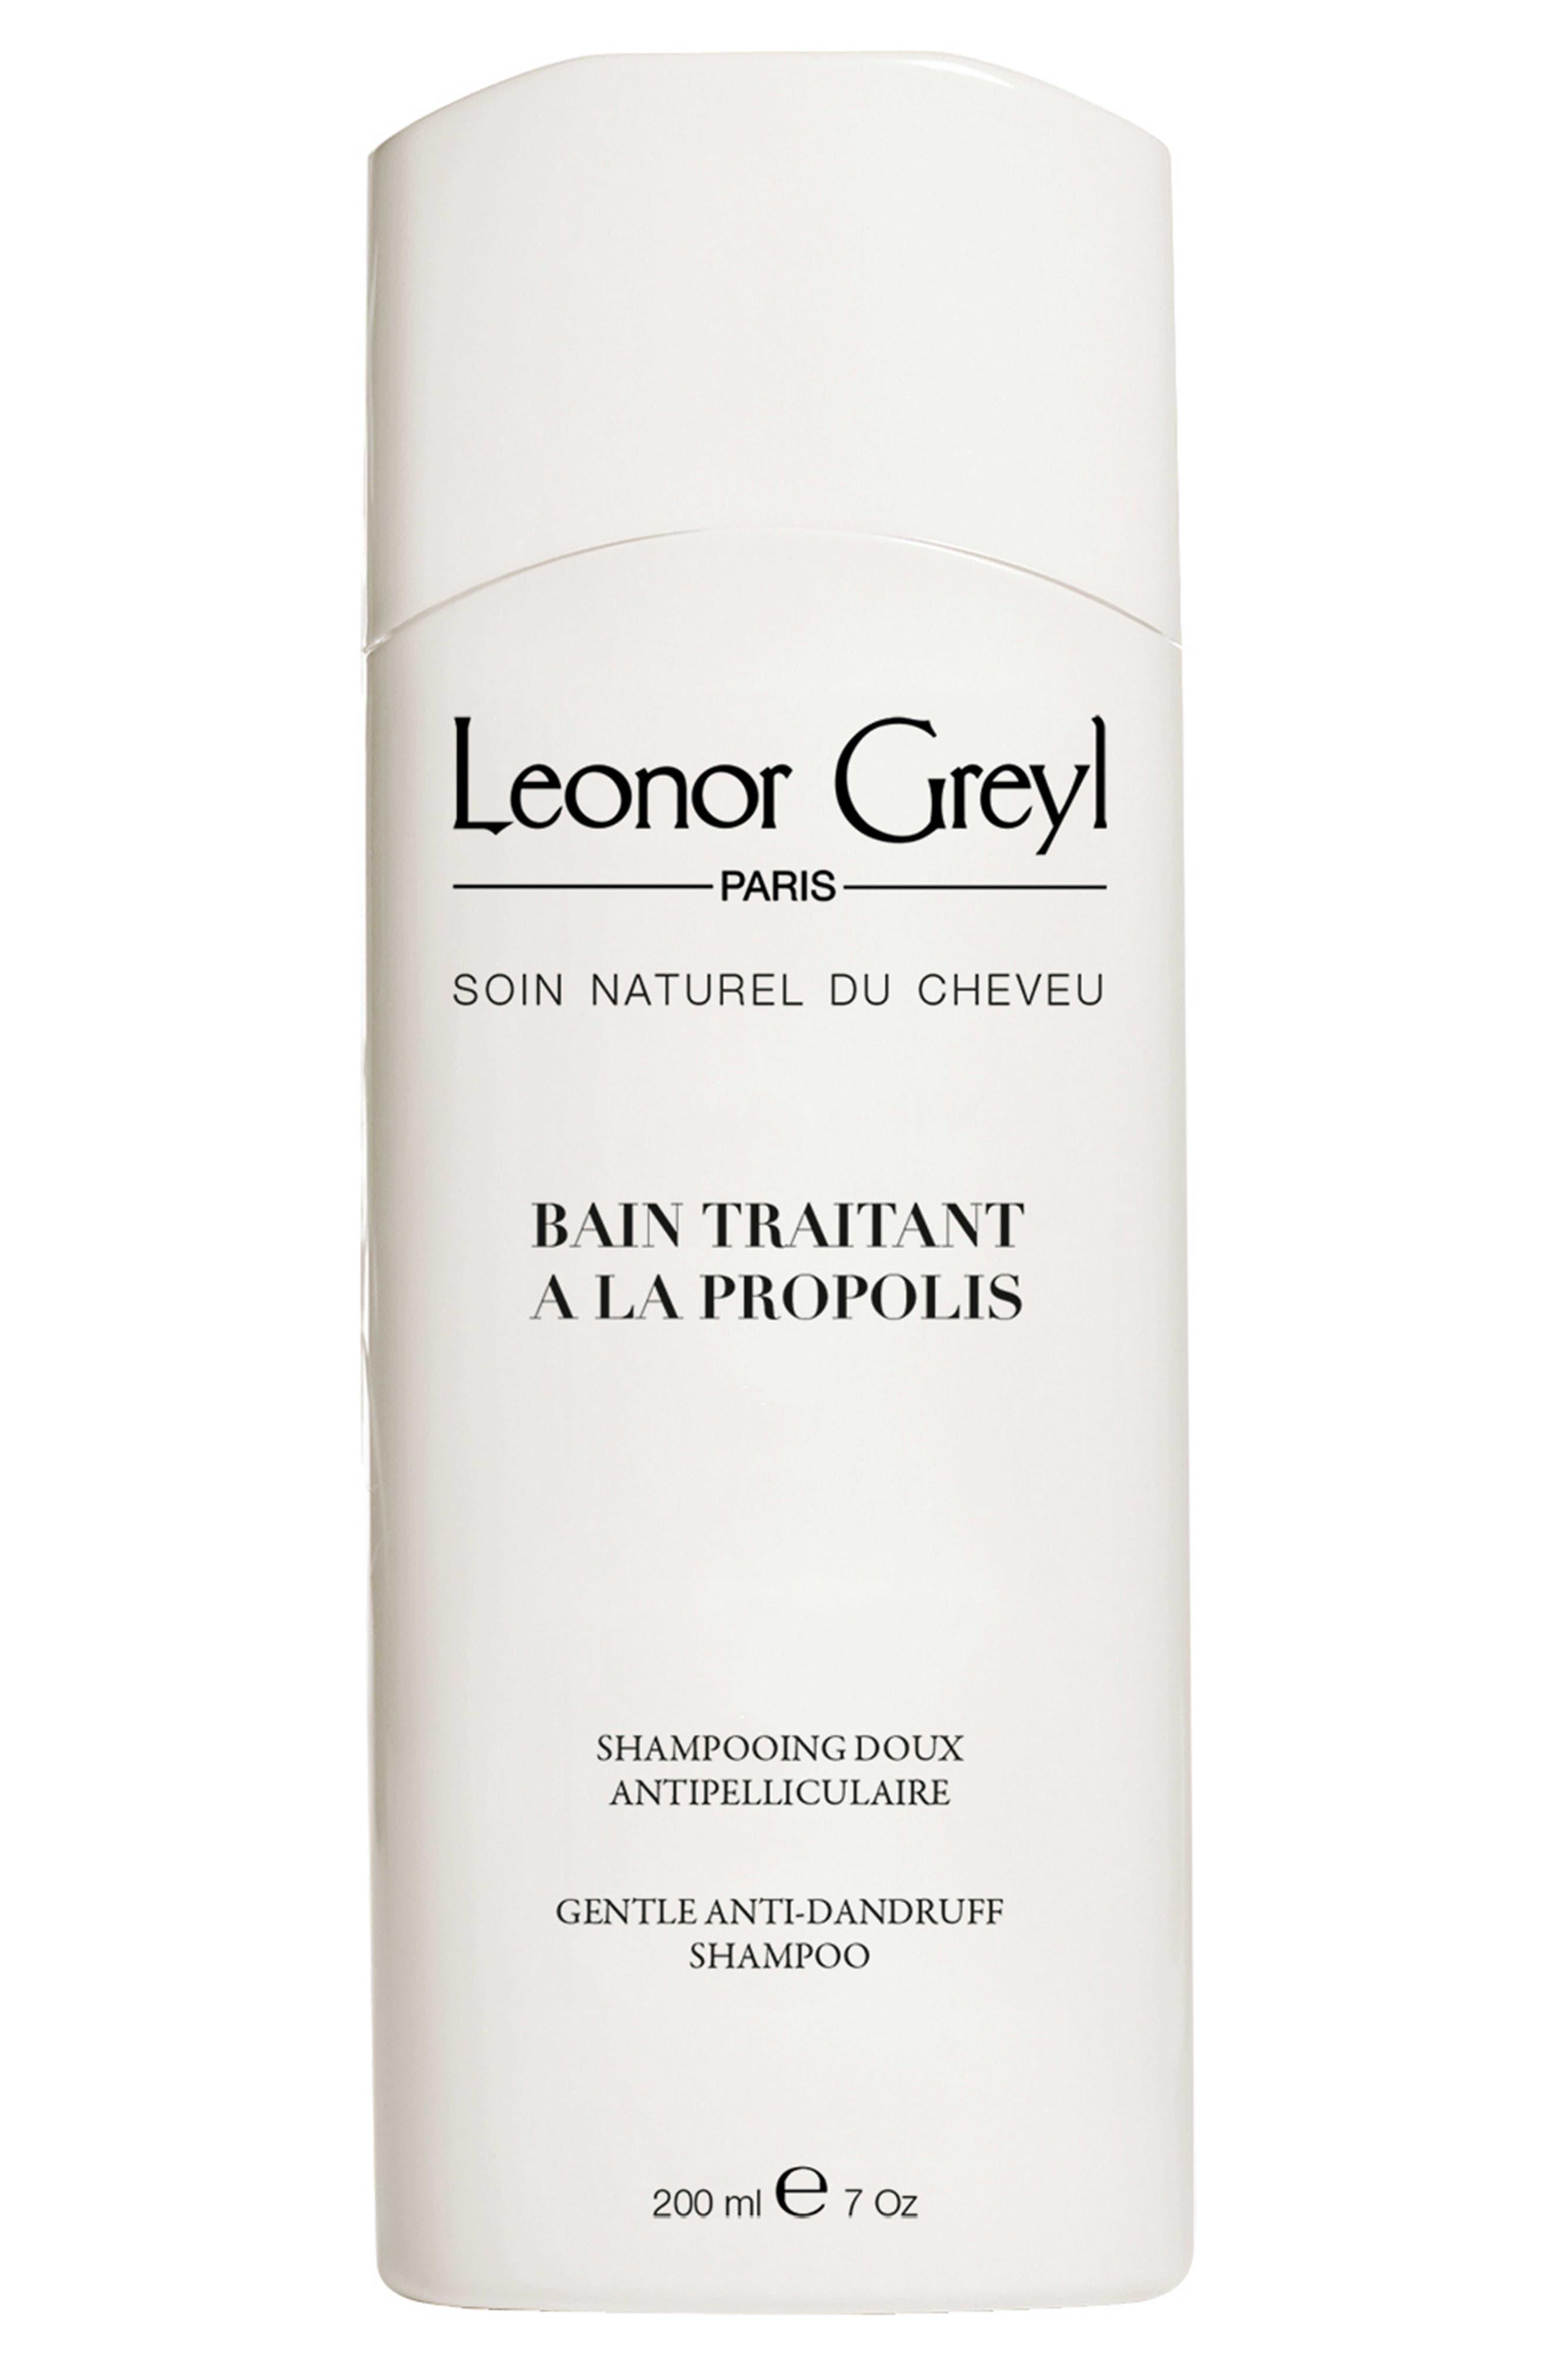 Leonor Greyl PARIS 'Gentle Anti-Dandruff Shampoo'